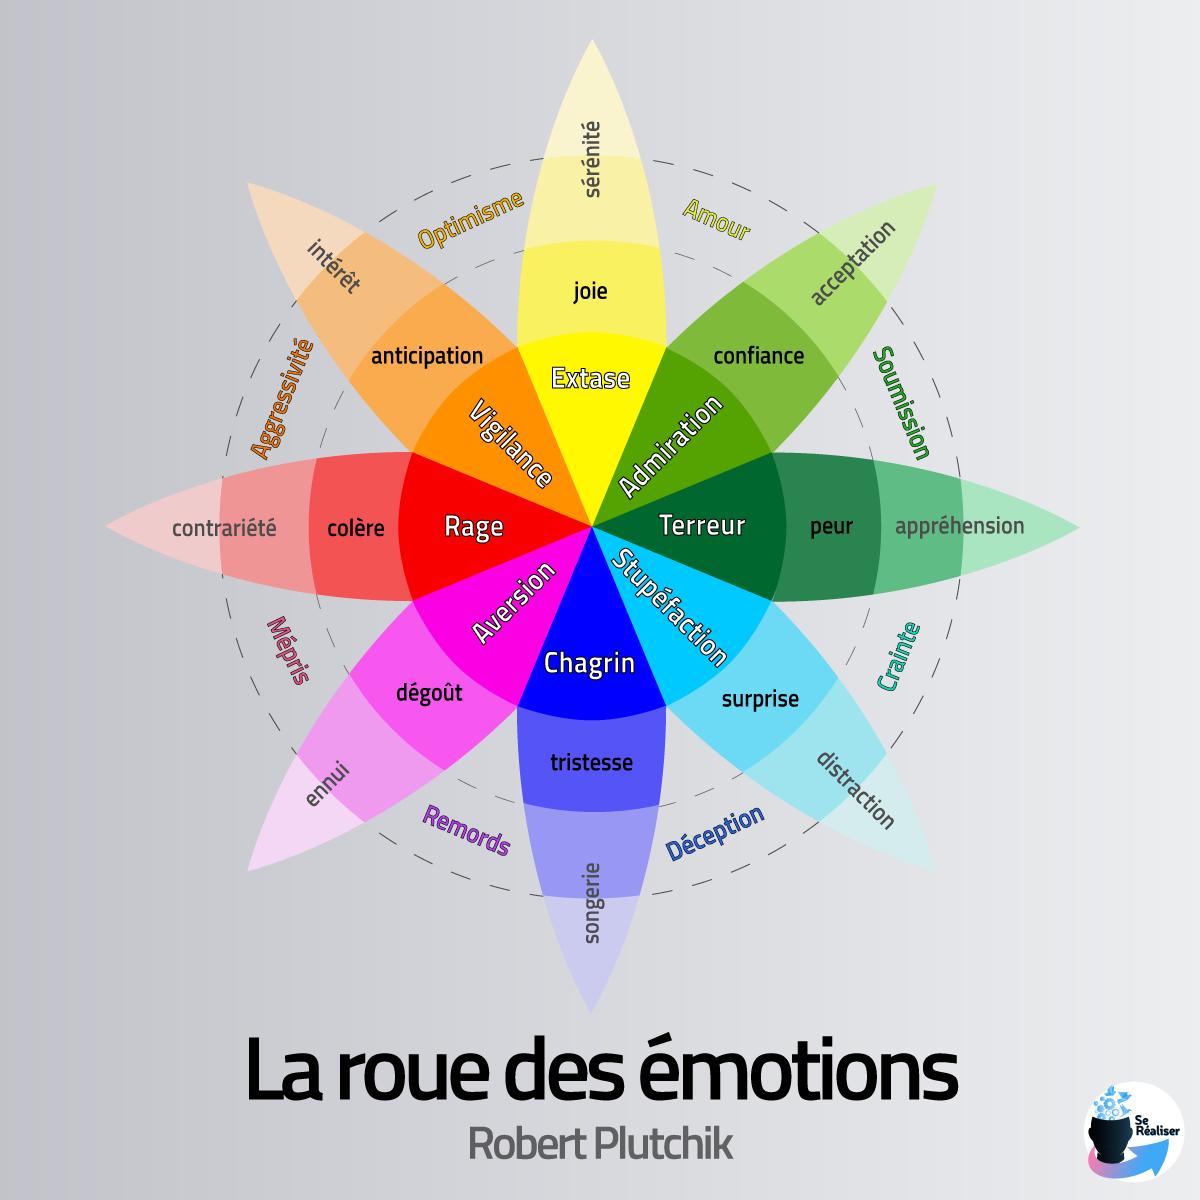 classification des émotions selon Robert Plutchik